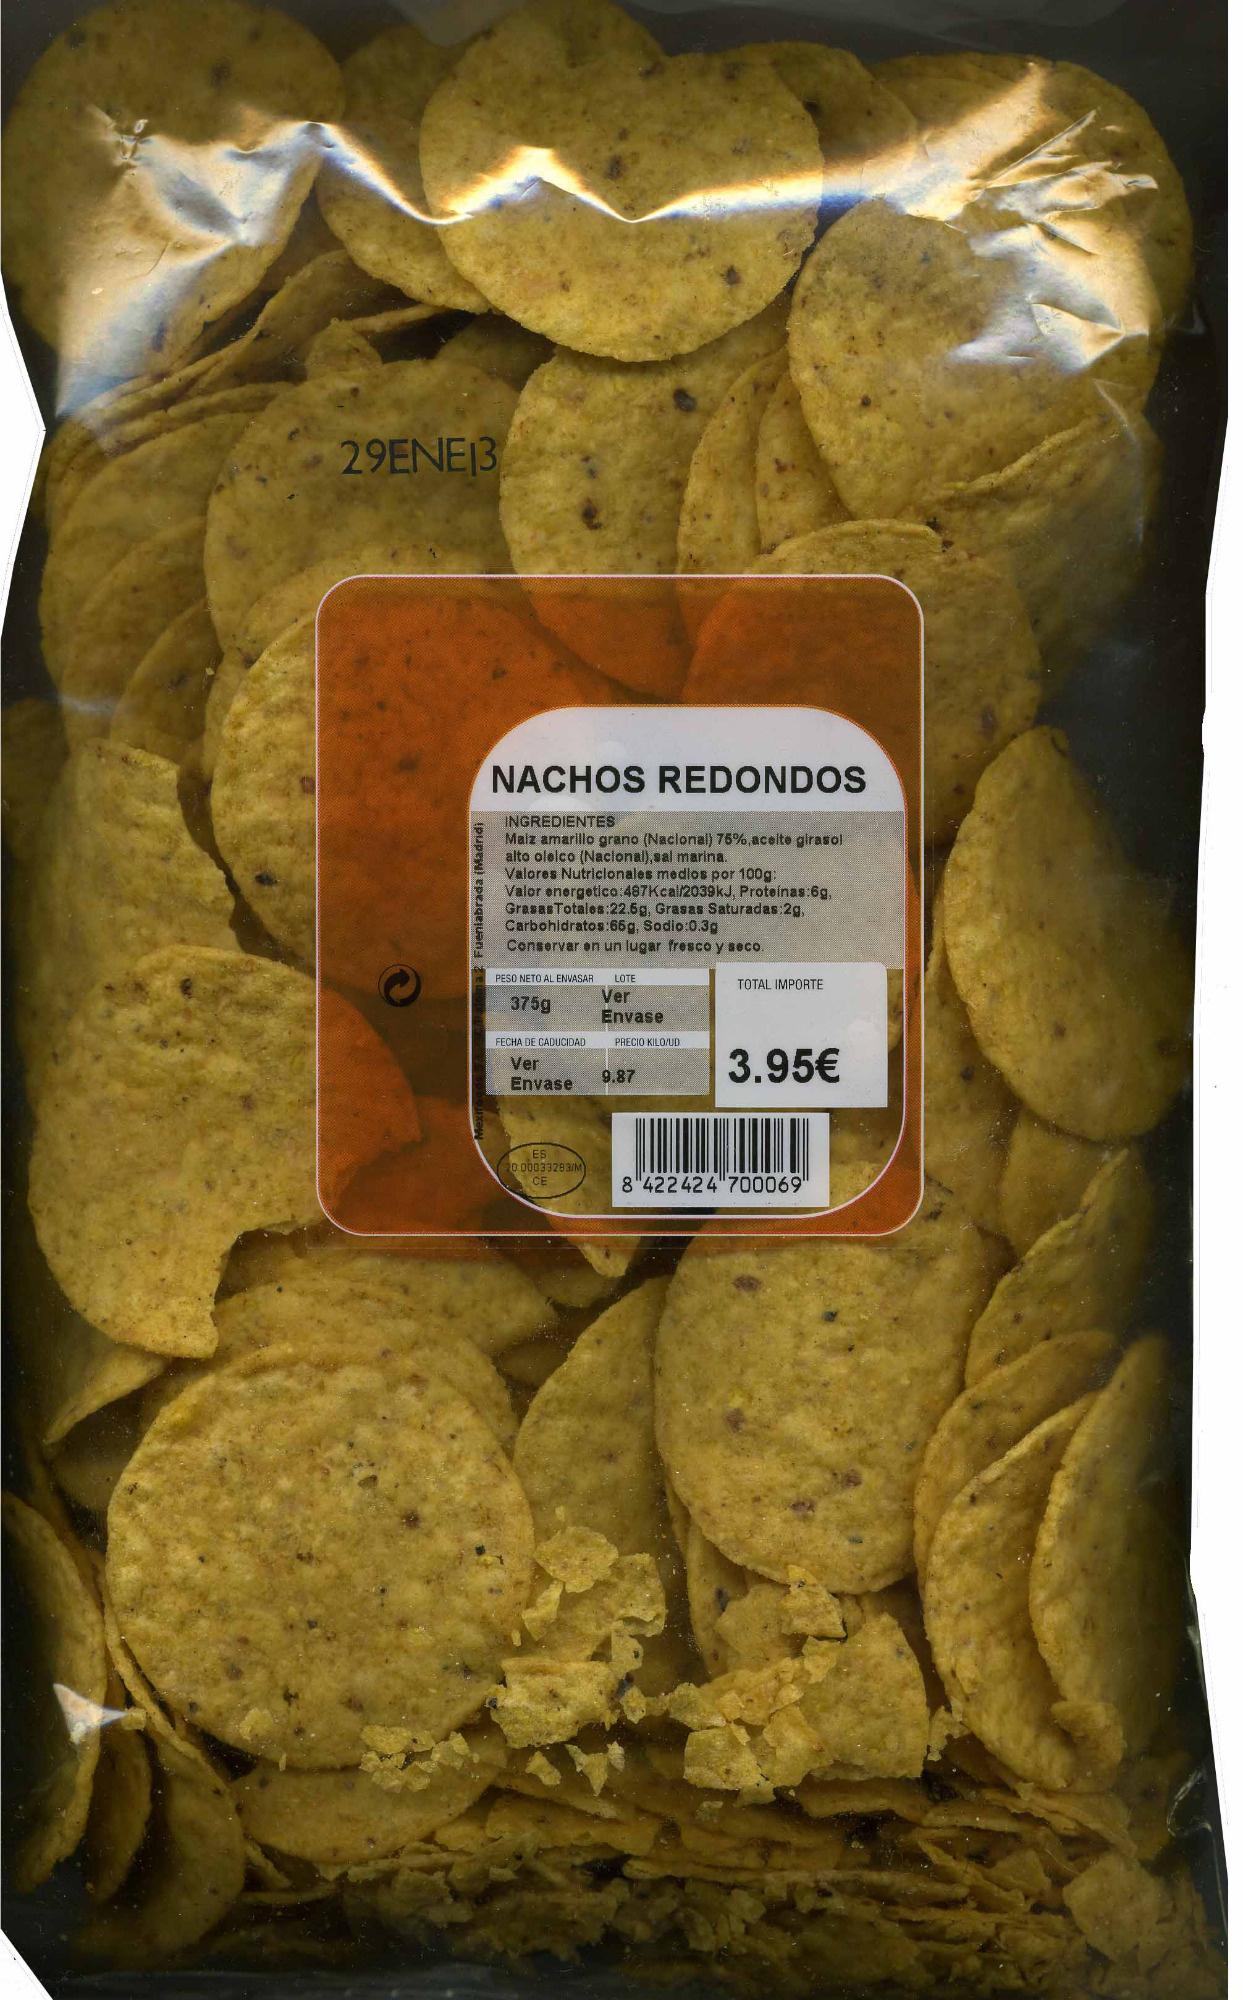 Nachos redondos - Product